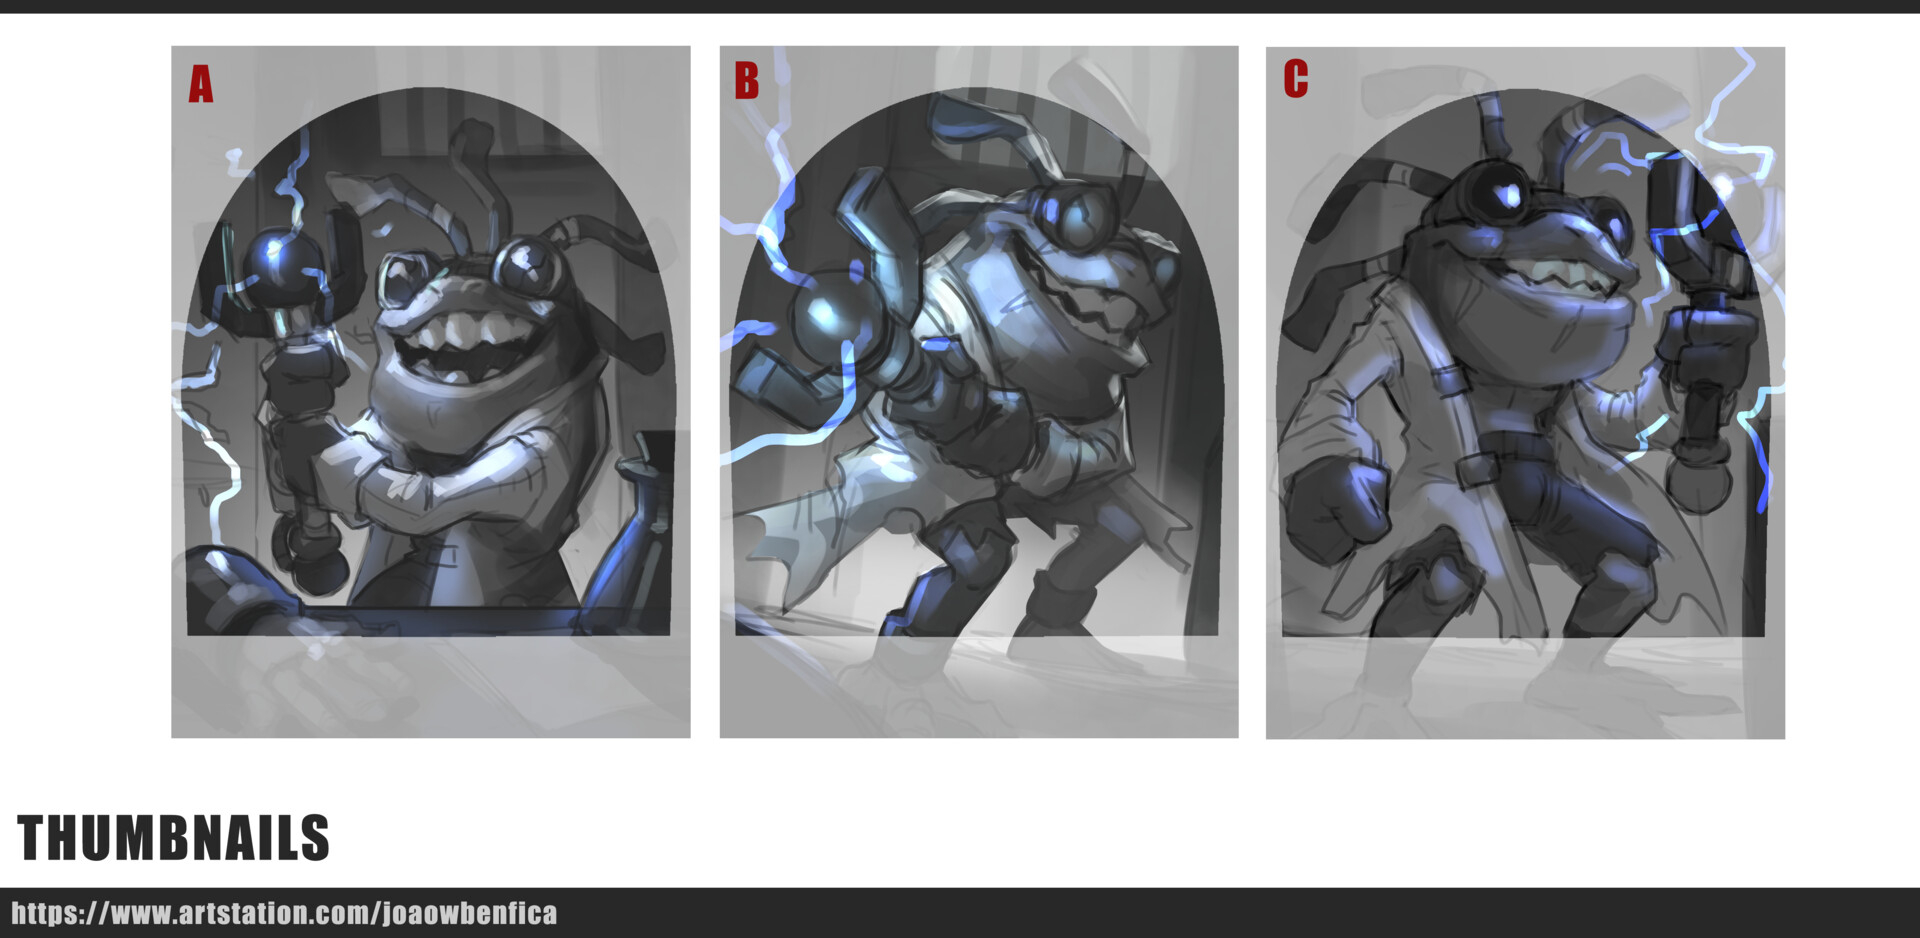 https://youre.outof.cards/media/uploads/91/fe/91fe28c0-554c-4dea-b58f-fd420a3eb814/joao-vagner-dr-murkstein-concept-art-base-part-3-thumbnails.jpg